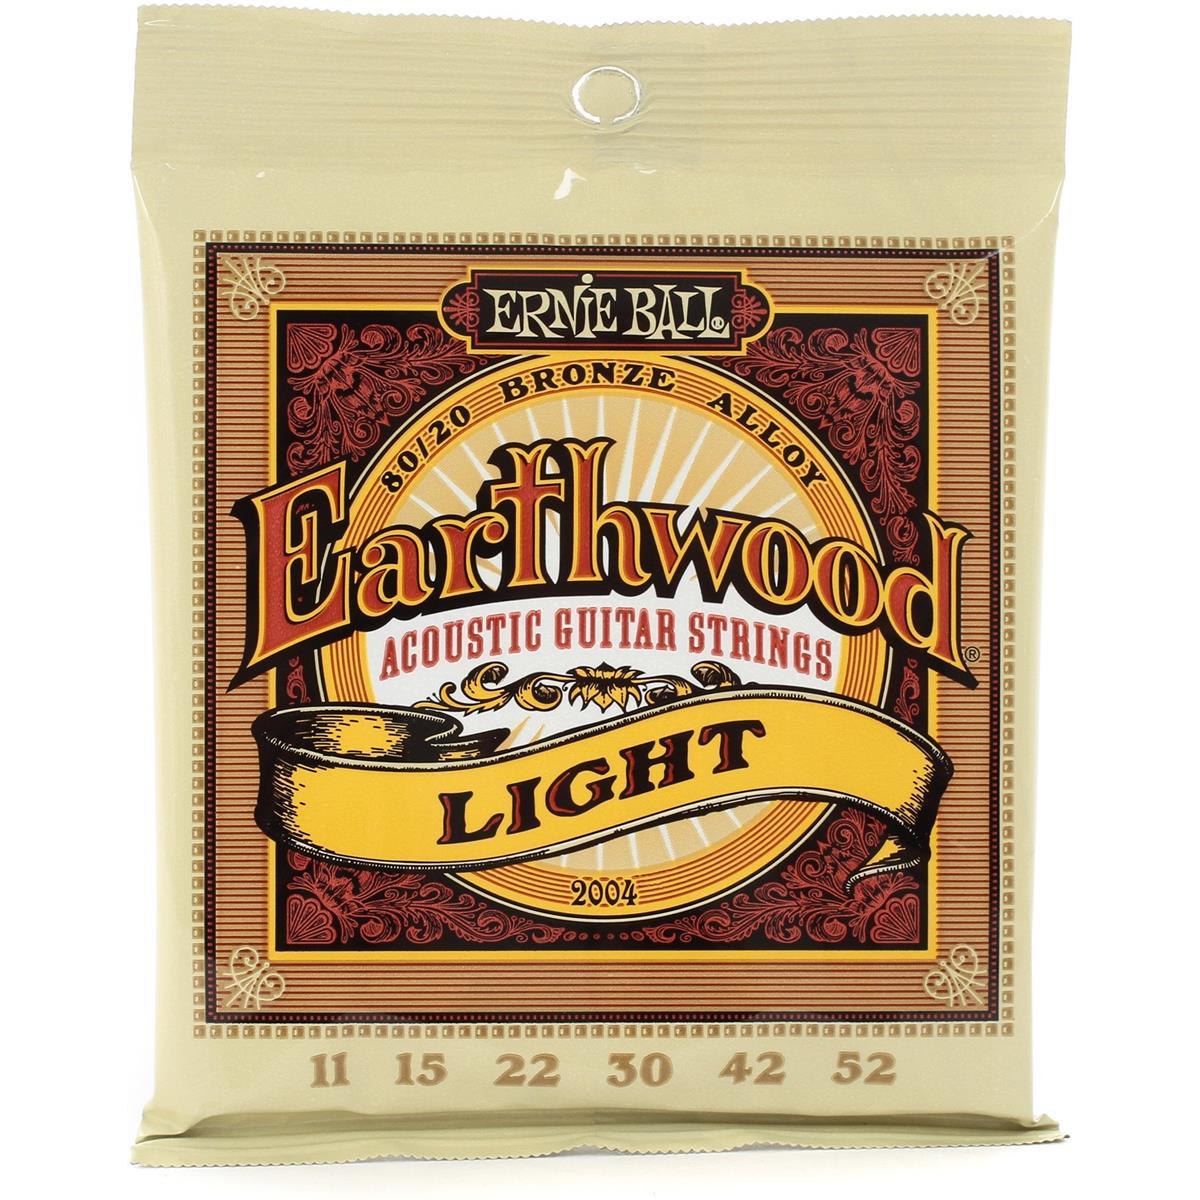 ERNIE-BALL-2004-CORDE-ACUSTICA-11-Earthwood-Light-sku-6823